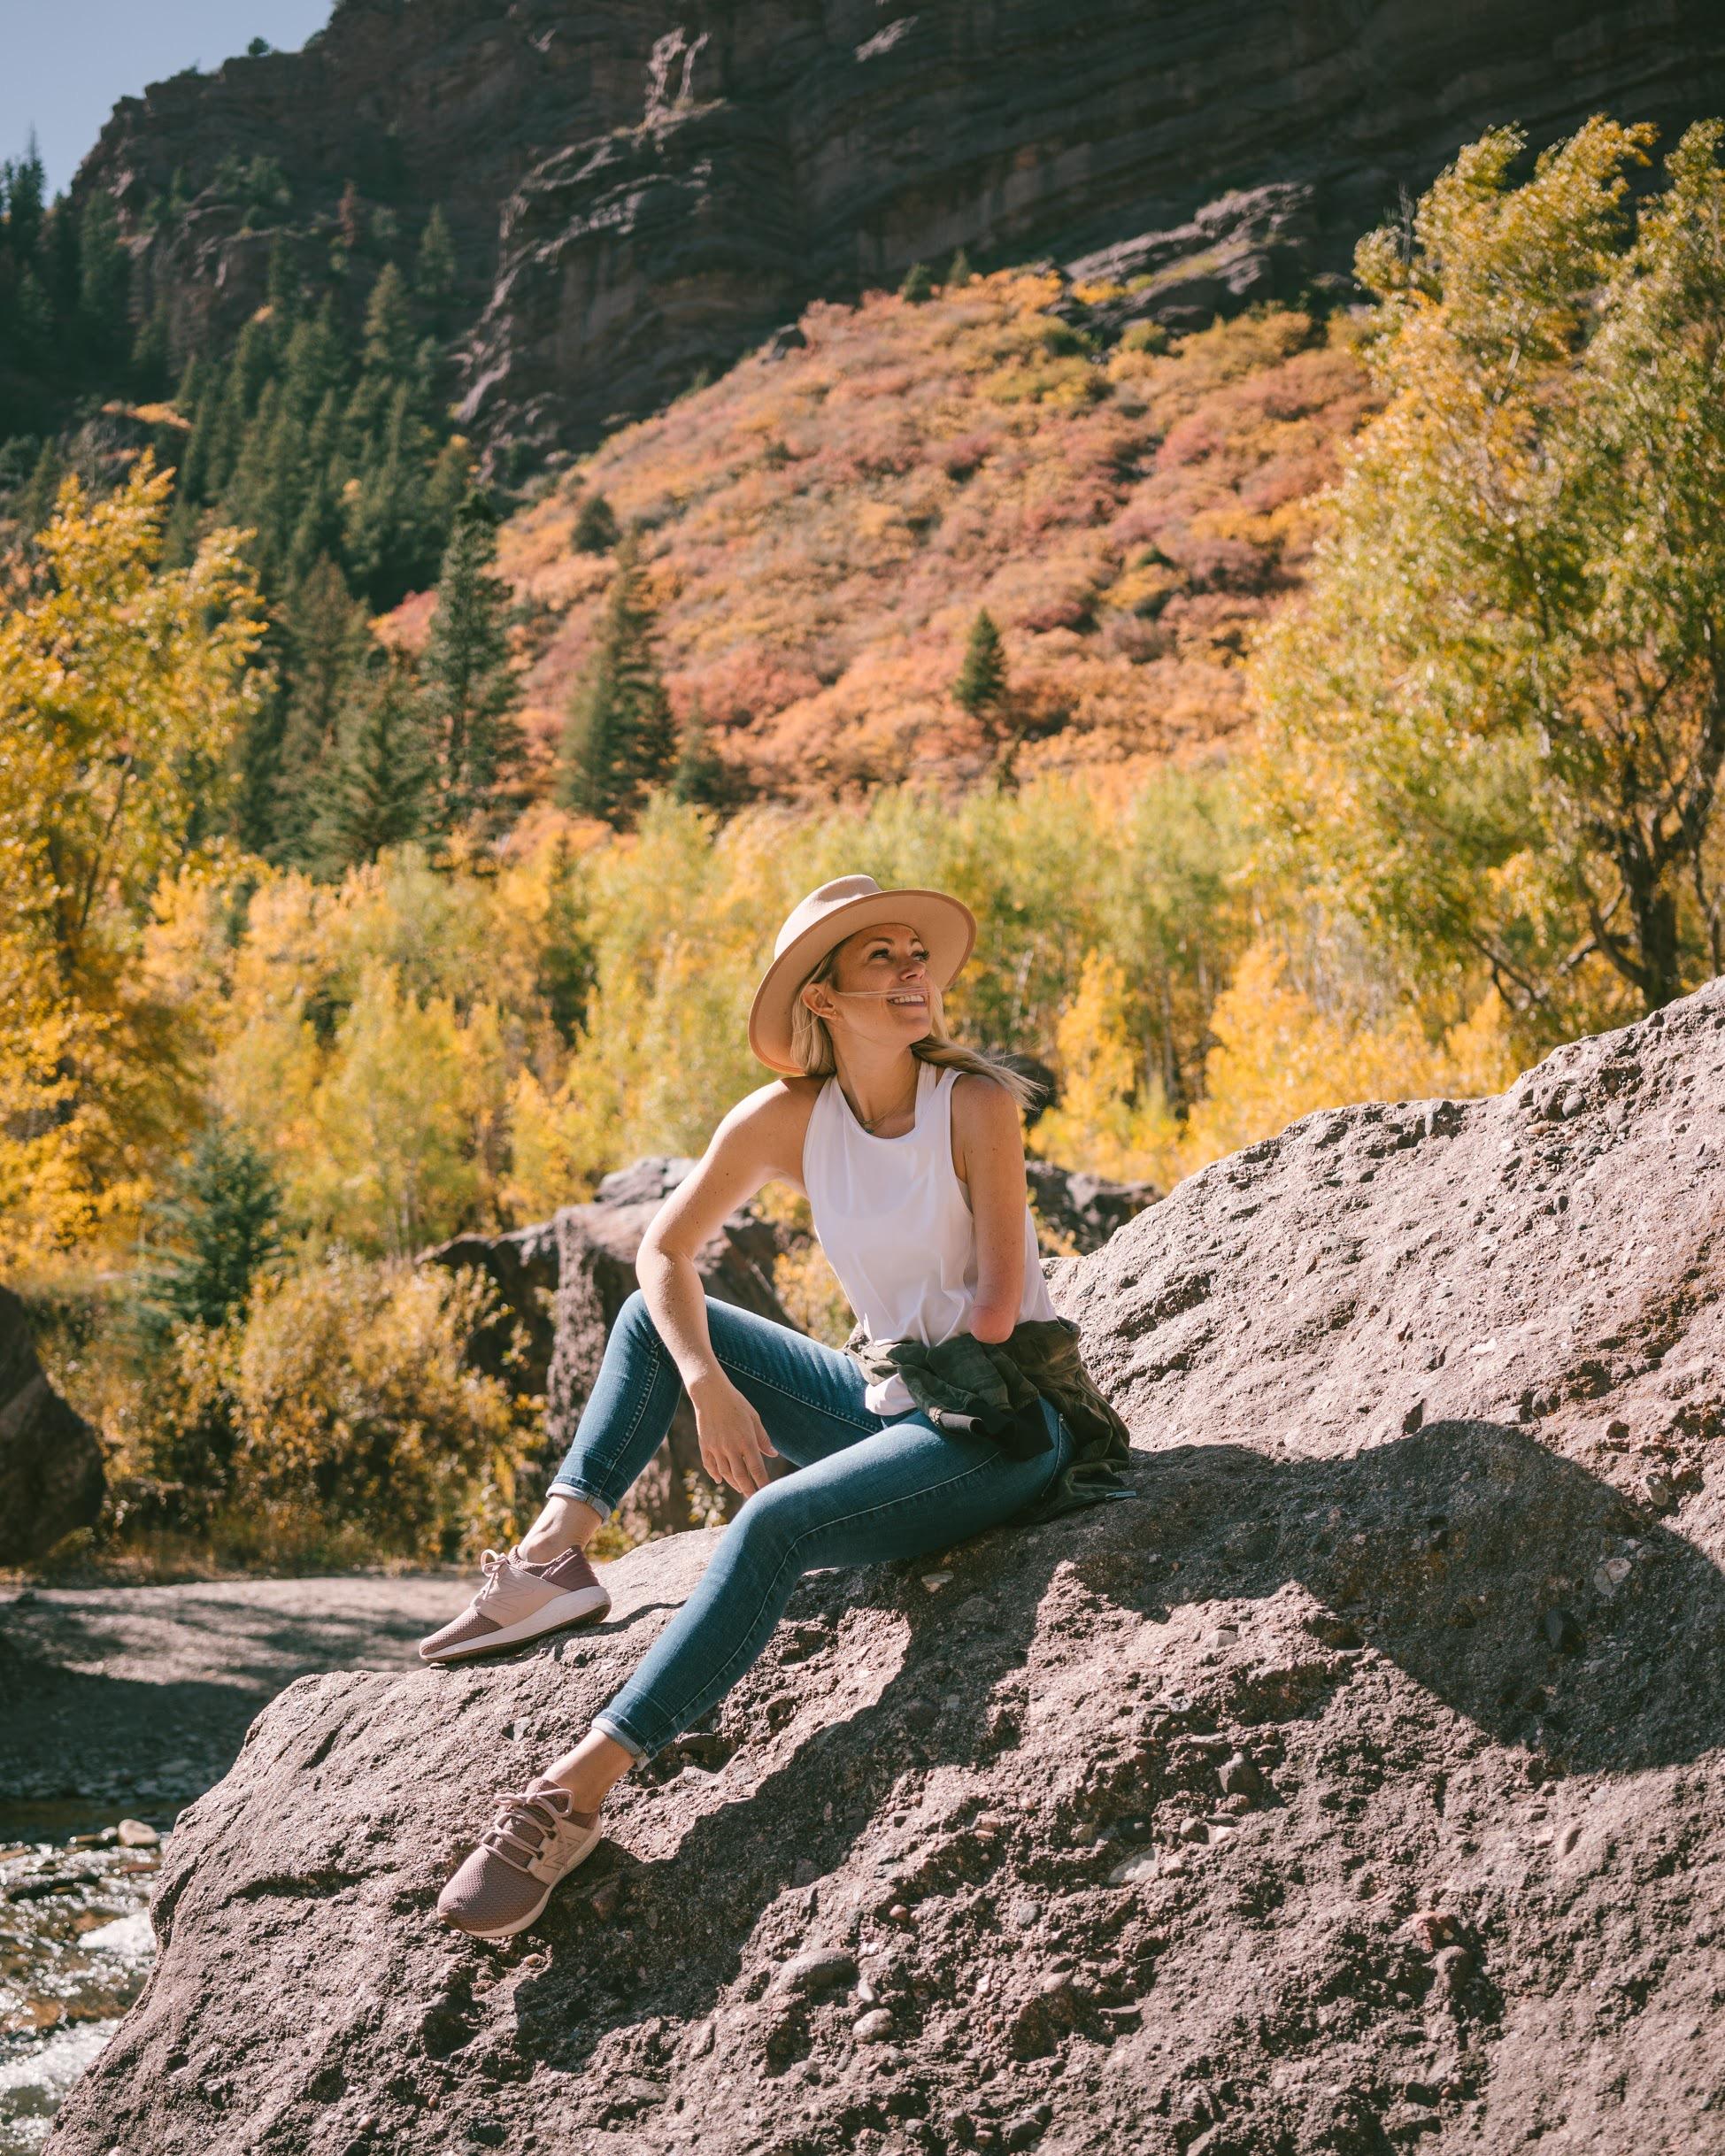 Redstone River Boulders – Redstone, CO